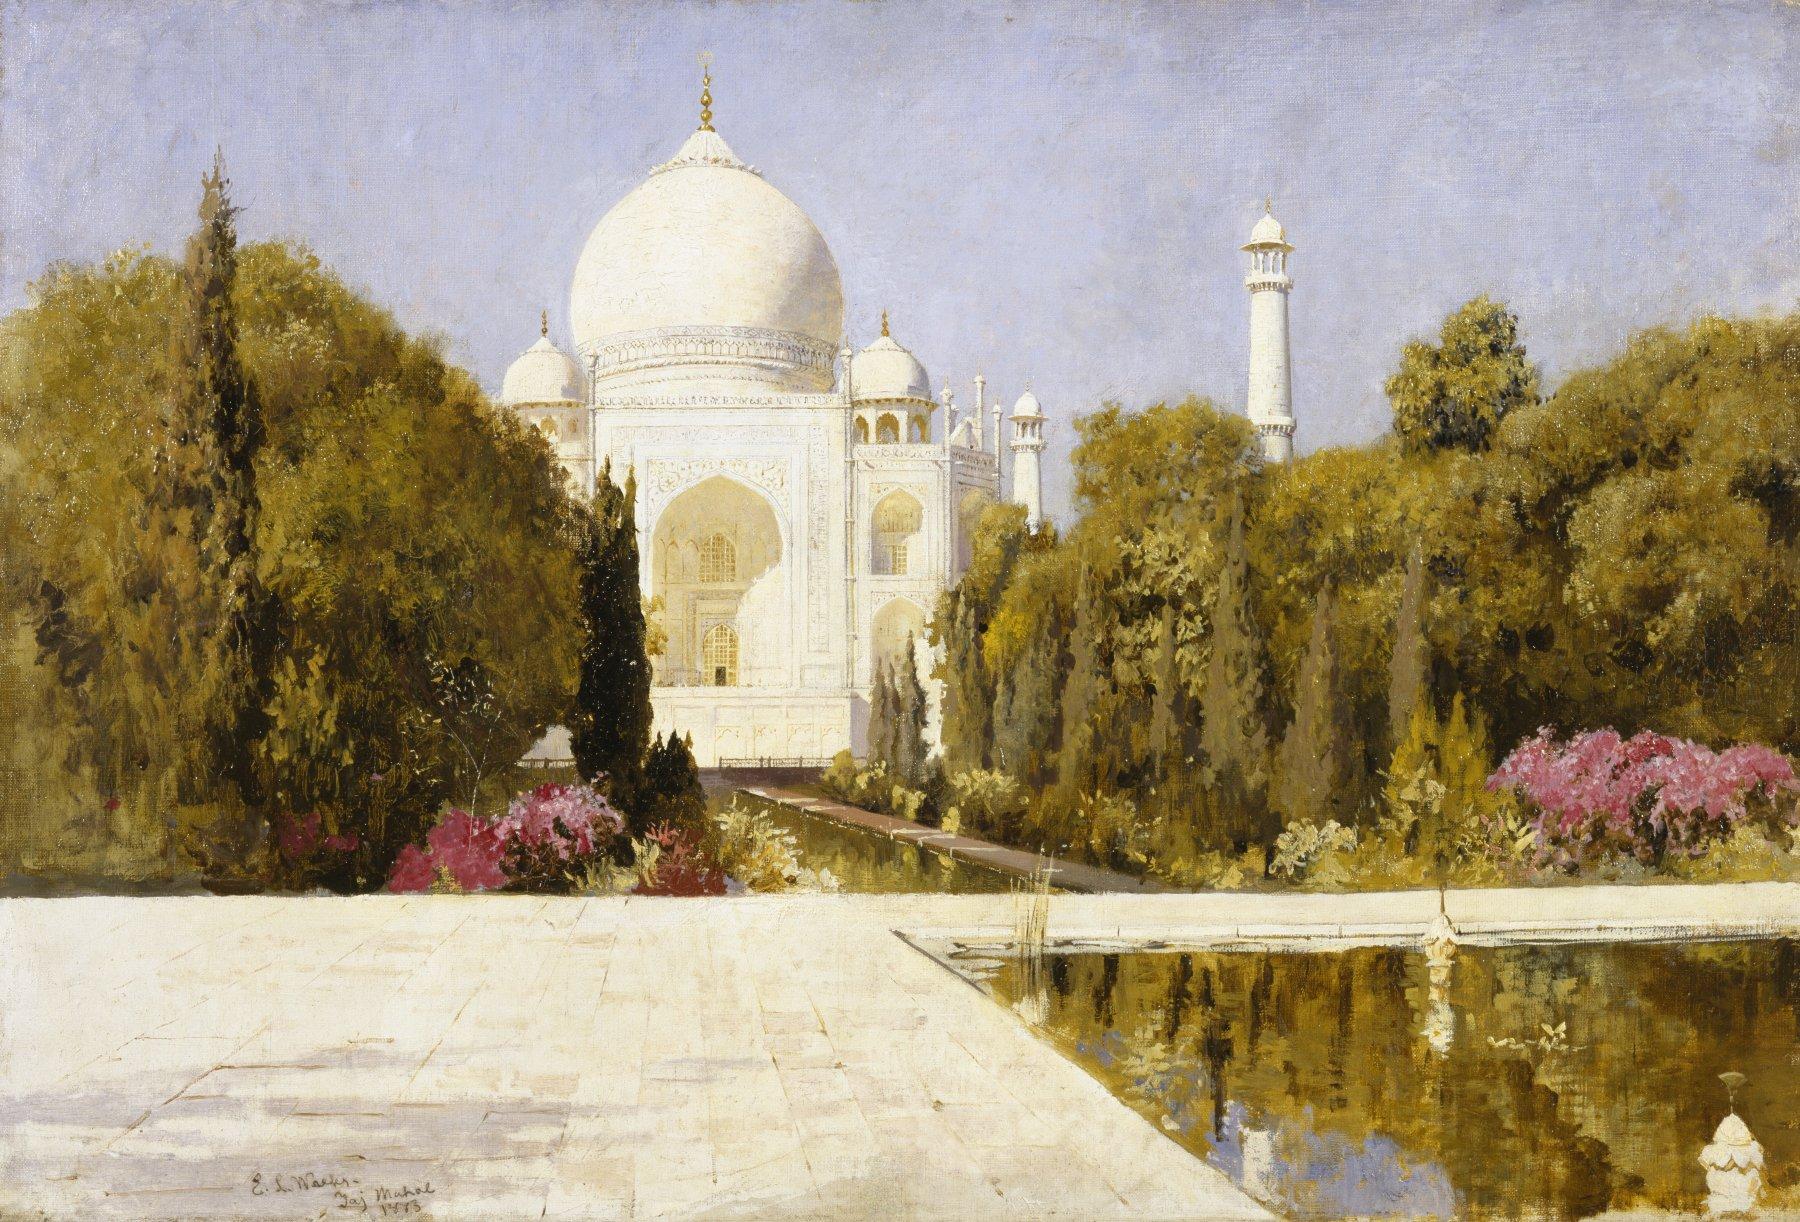 De l'Empire moghol